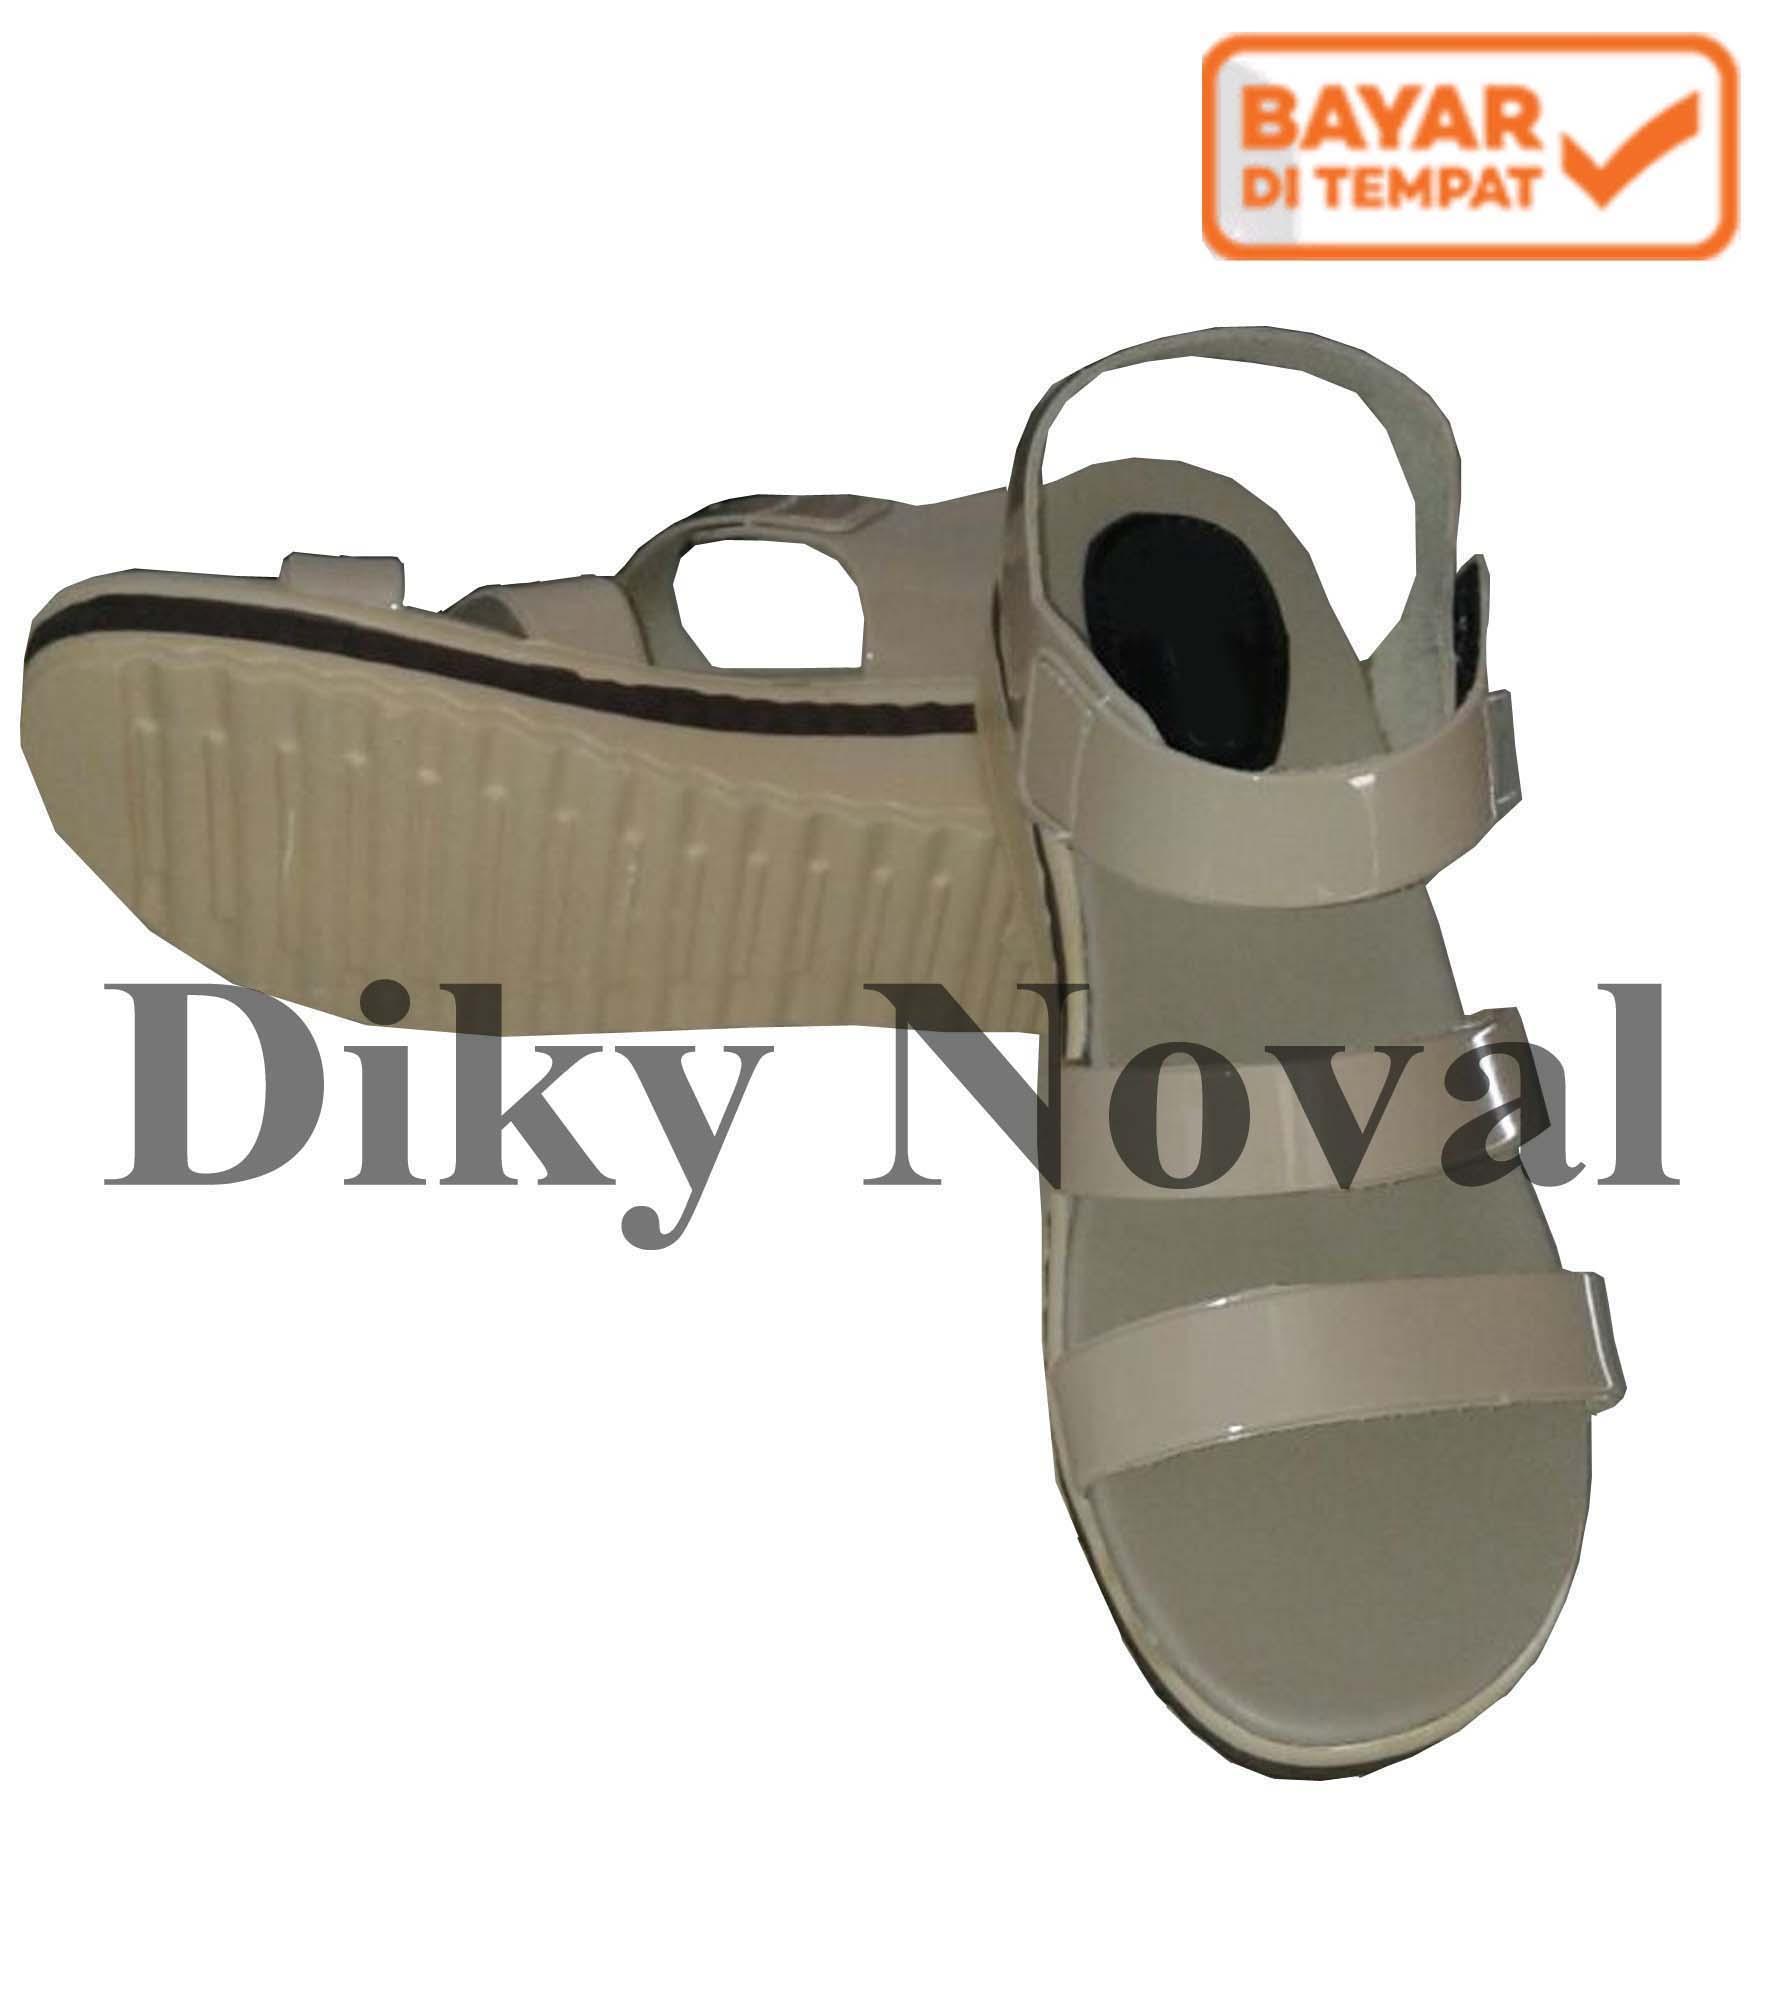 Buy Sell Cheapest Sandal Wedges Casual Best Quality Product Deals Sepatu Wanita Moca Tali Diky Noval Flip Flop